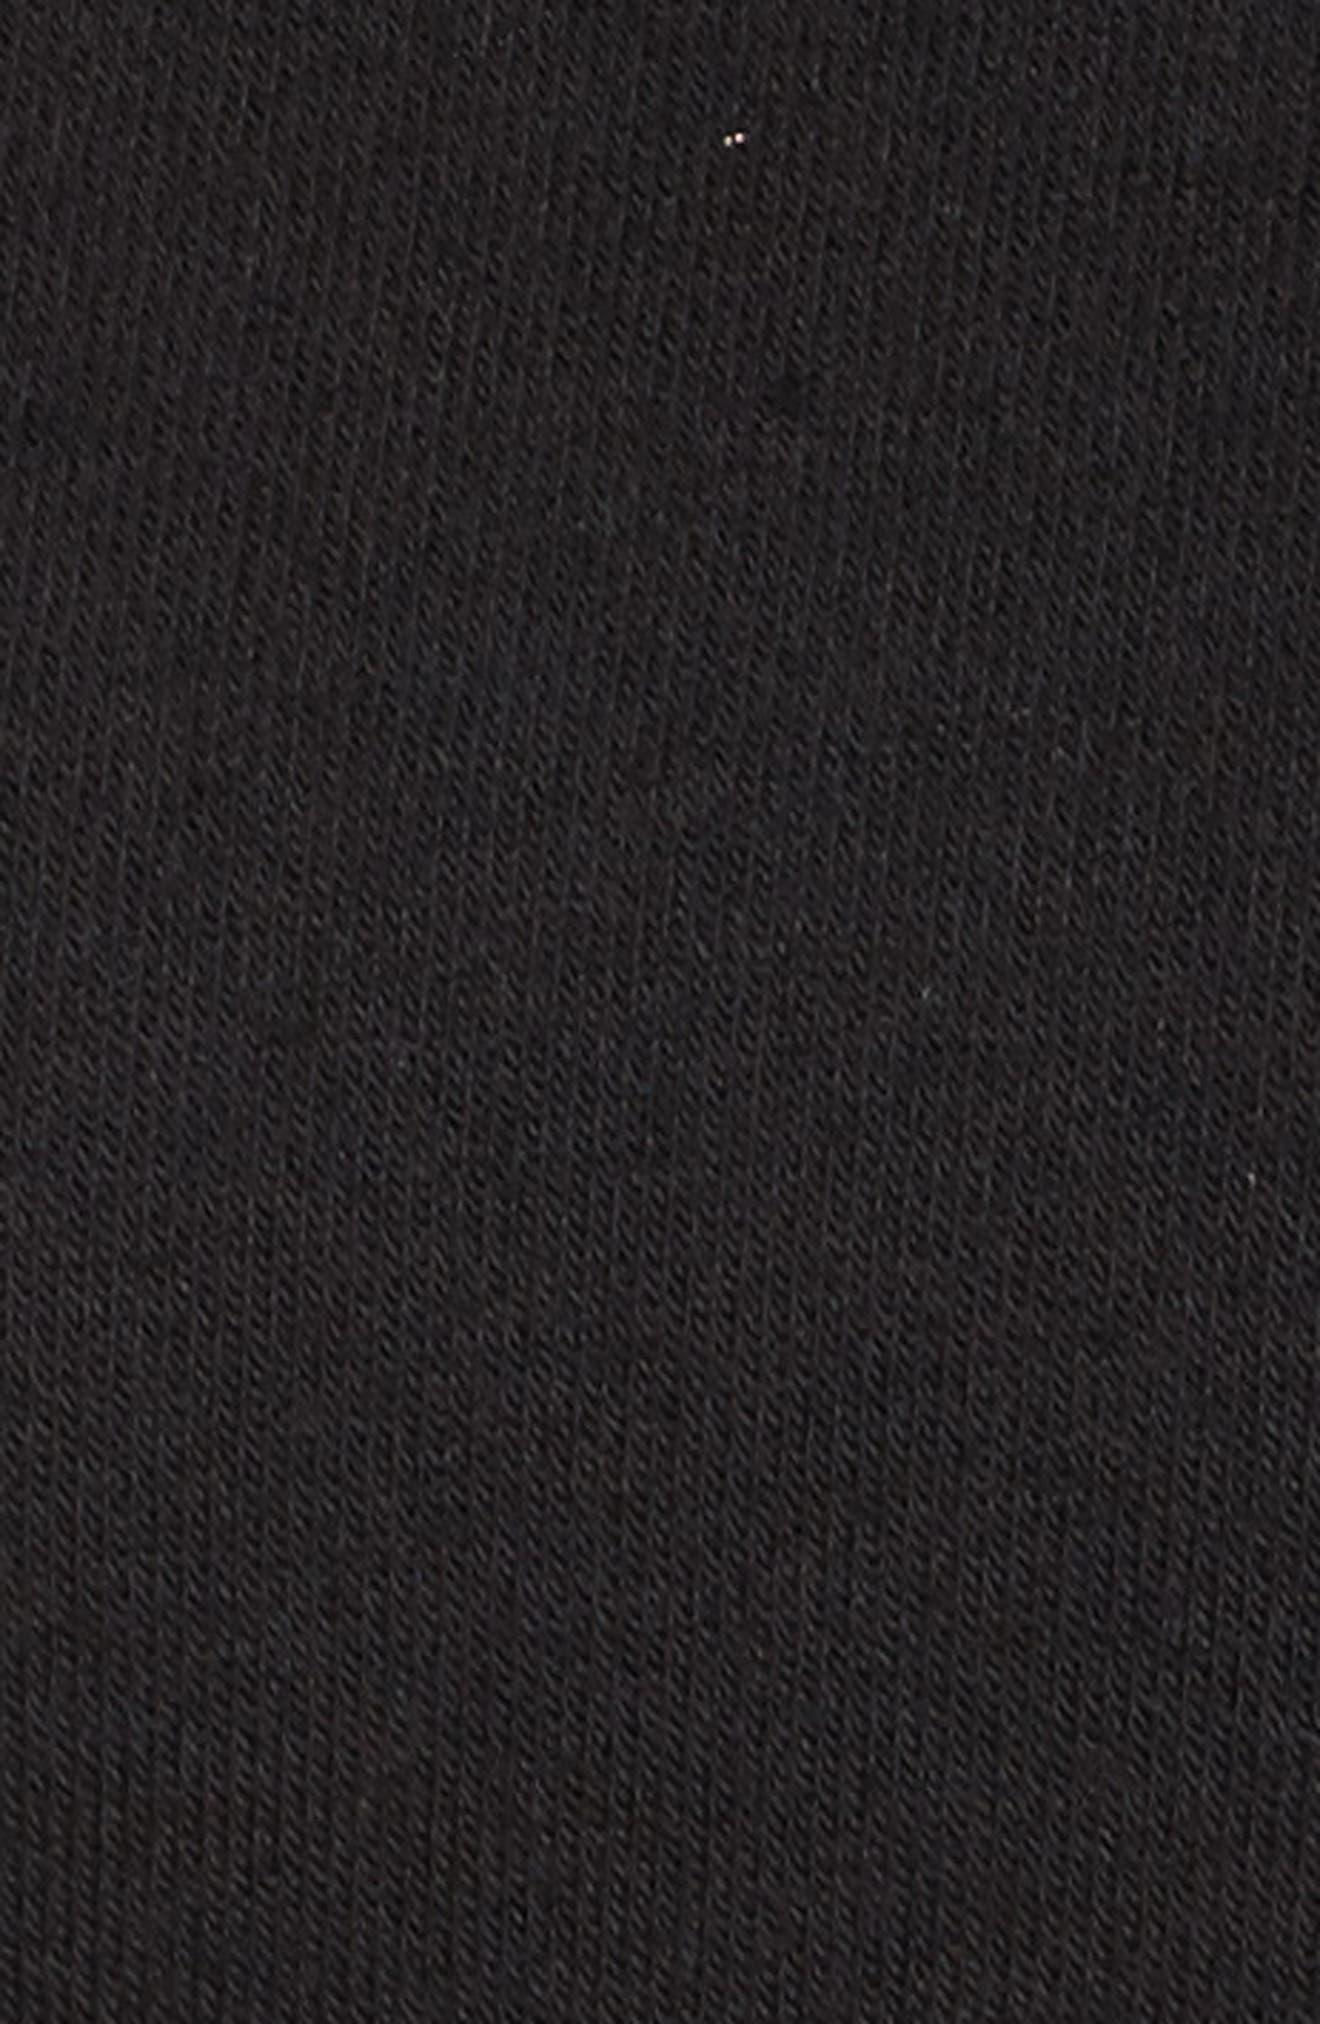 Slay Slashed Long Sleeve Hoodie,                             Alternate thumbnail 6, color,                             001